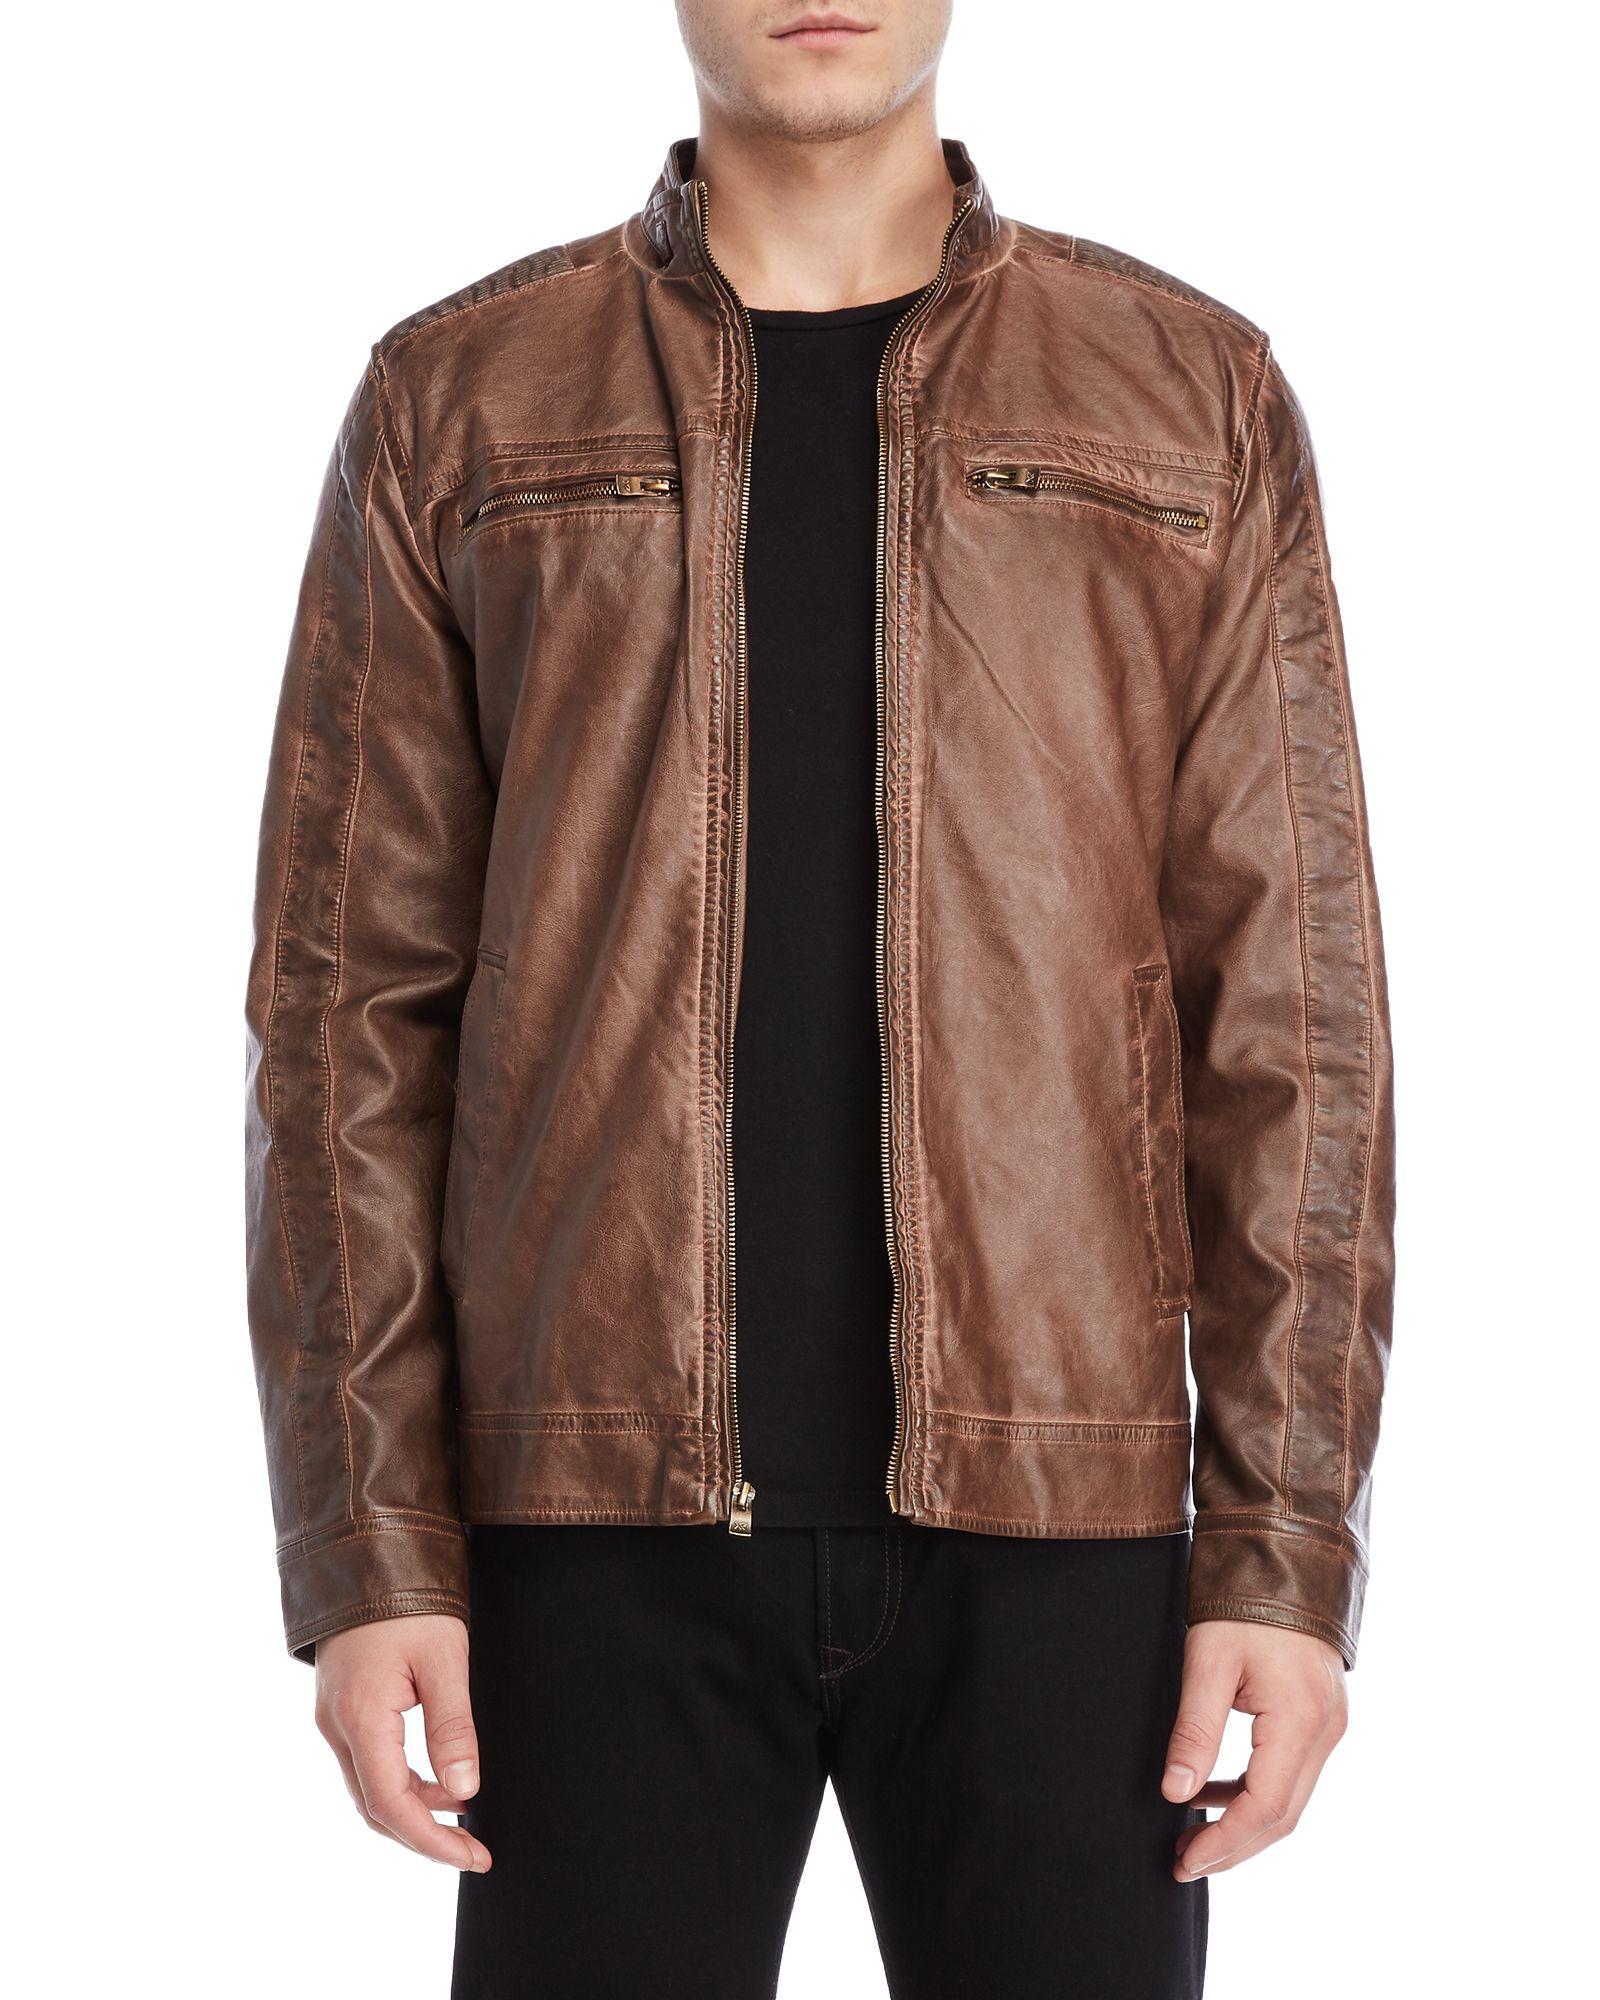 Brown Faux Leather Moto Jacket Jackets, Moto jacket